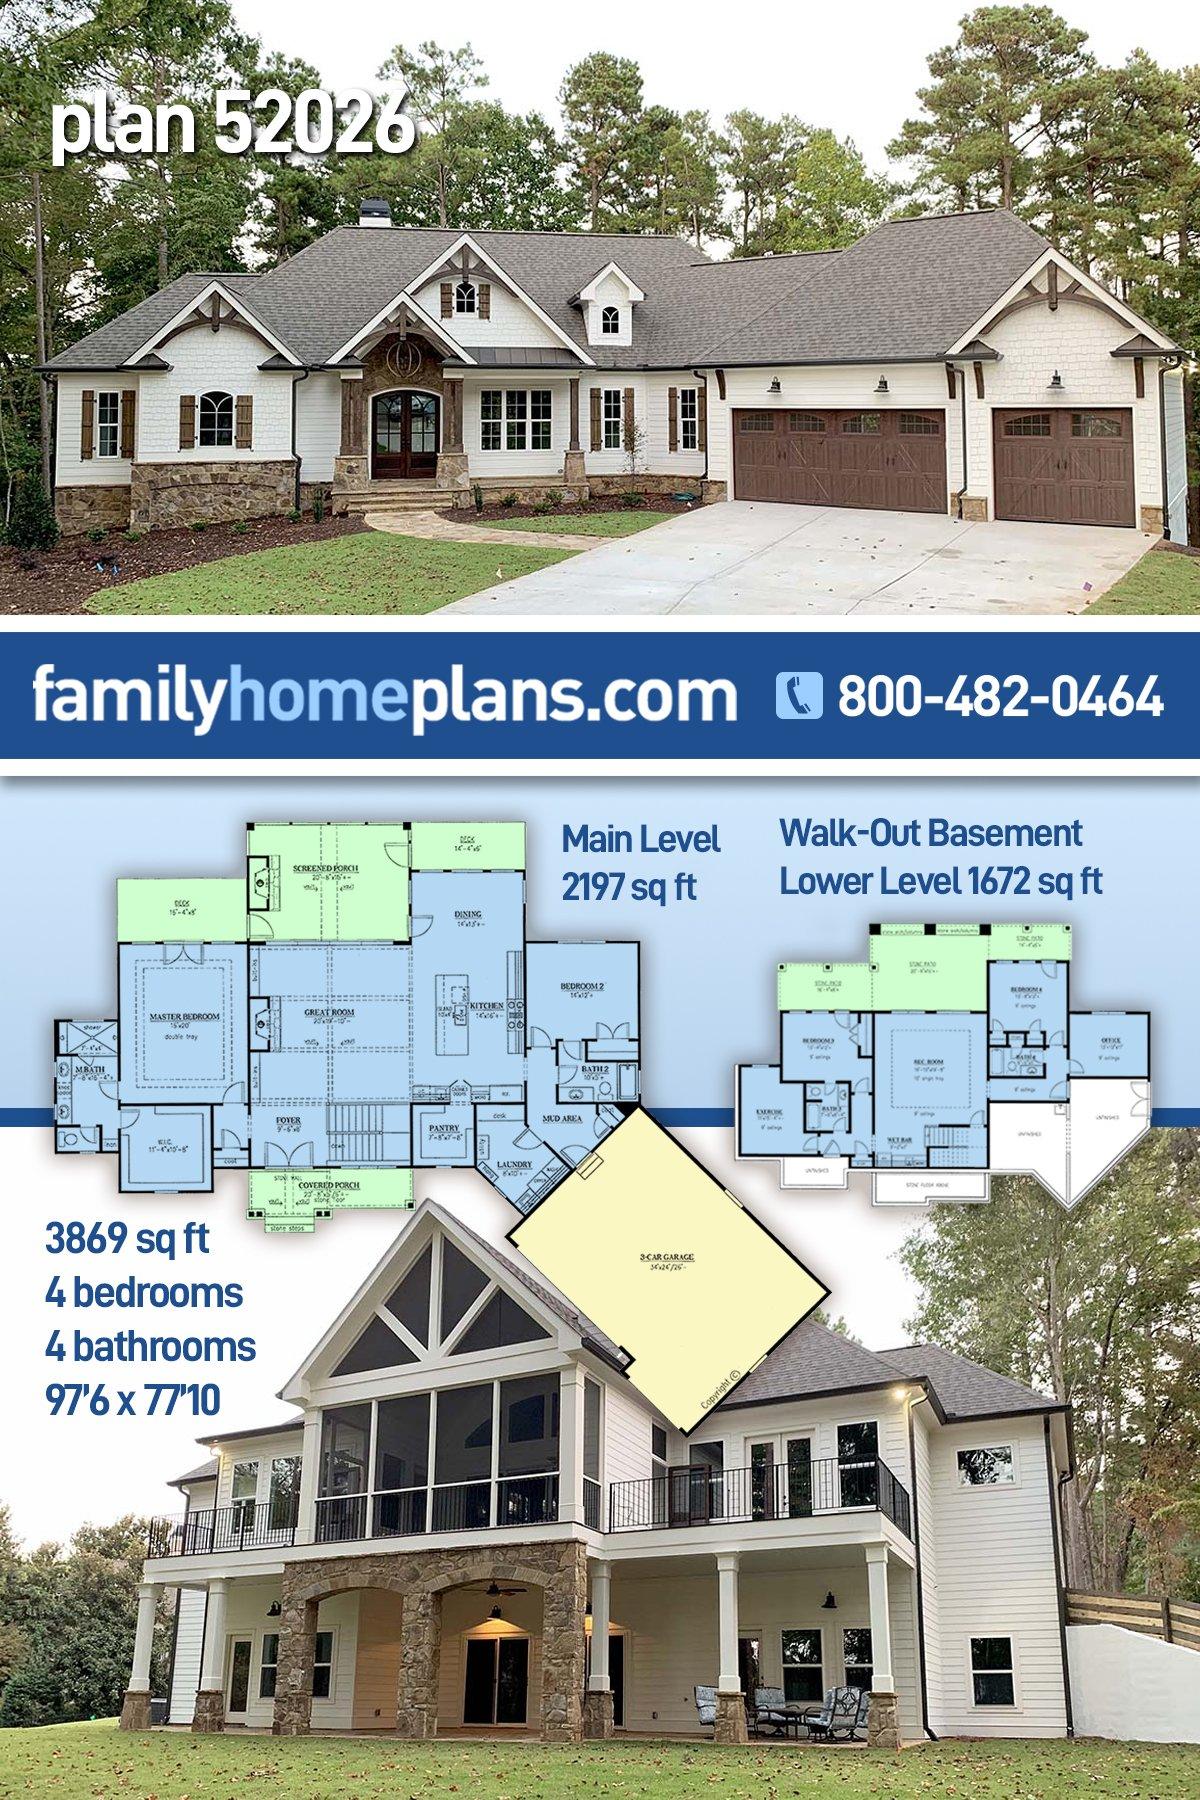 Cottage, Craftsman House Plan 52026 with 4 Beds, 4 Baths, 3 Car Garage